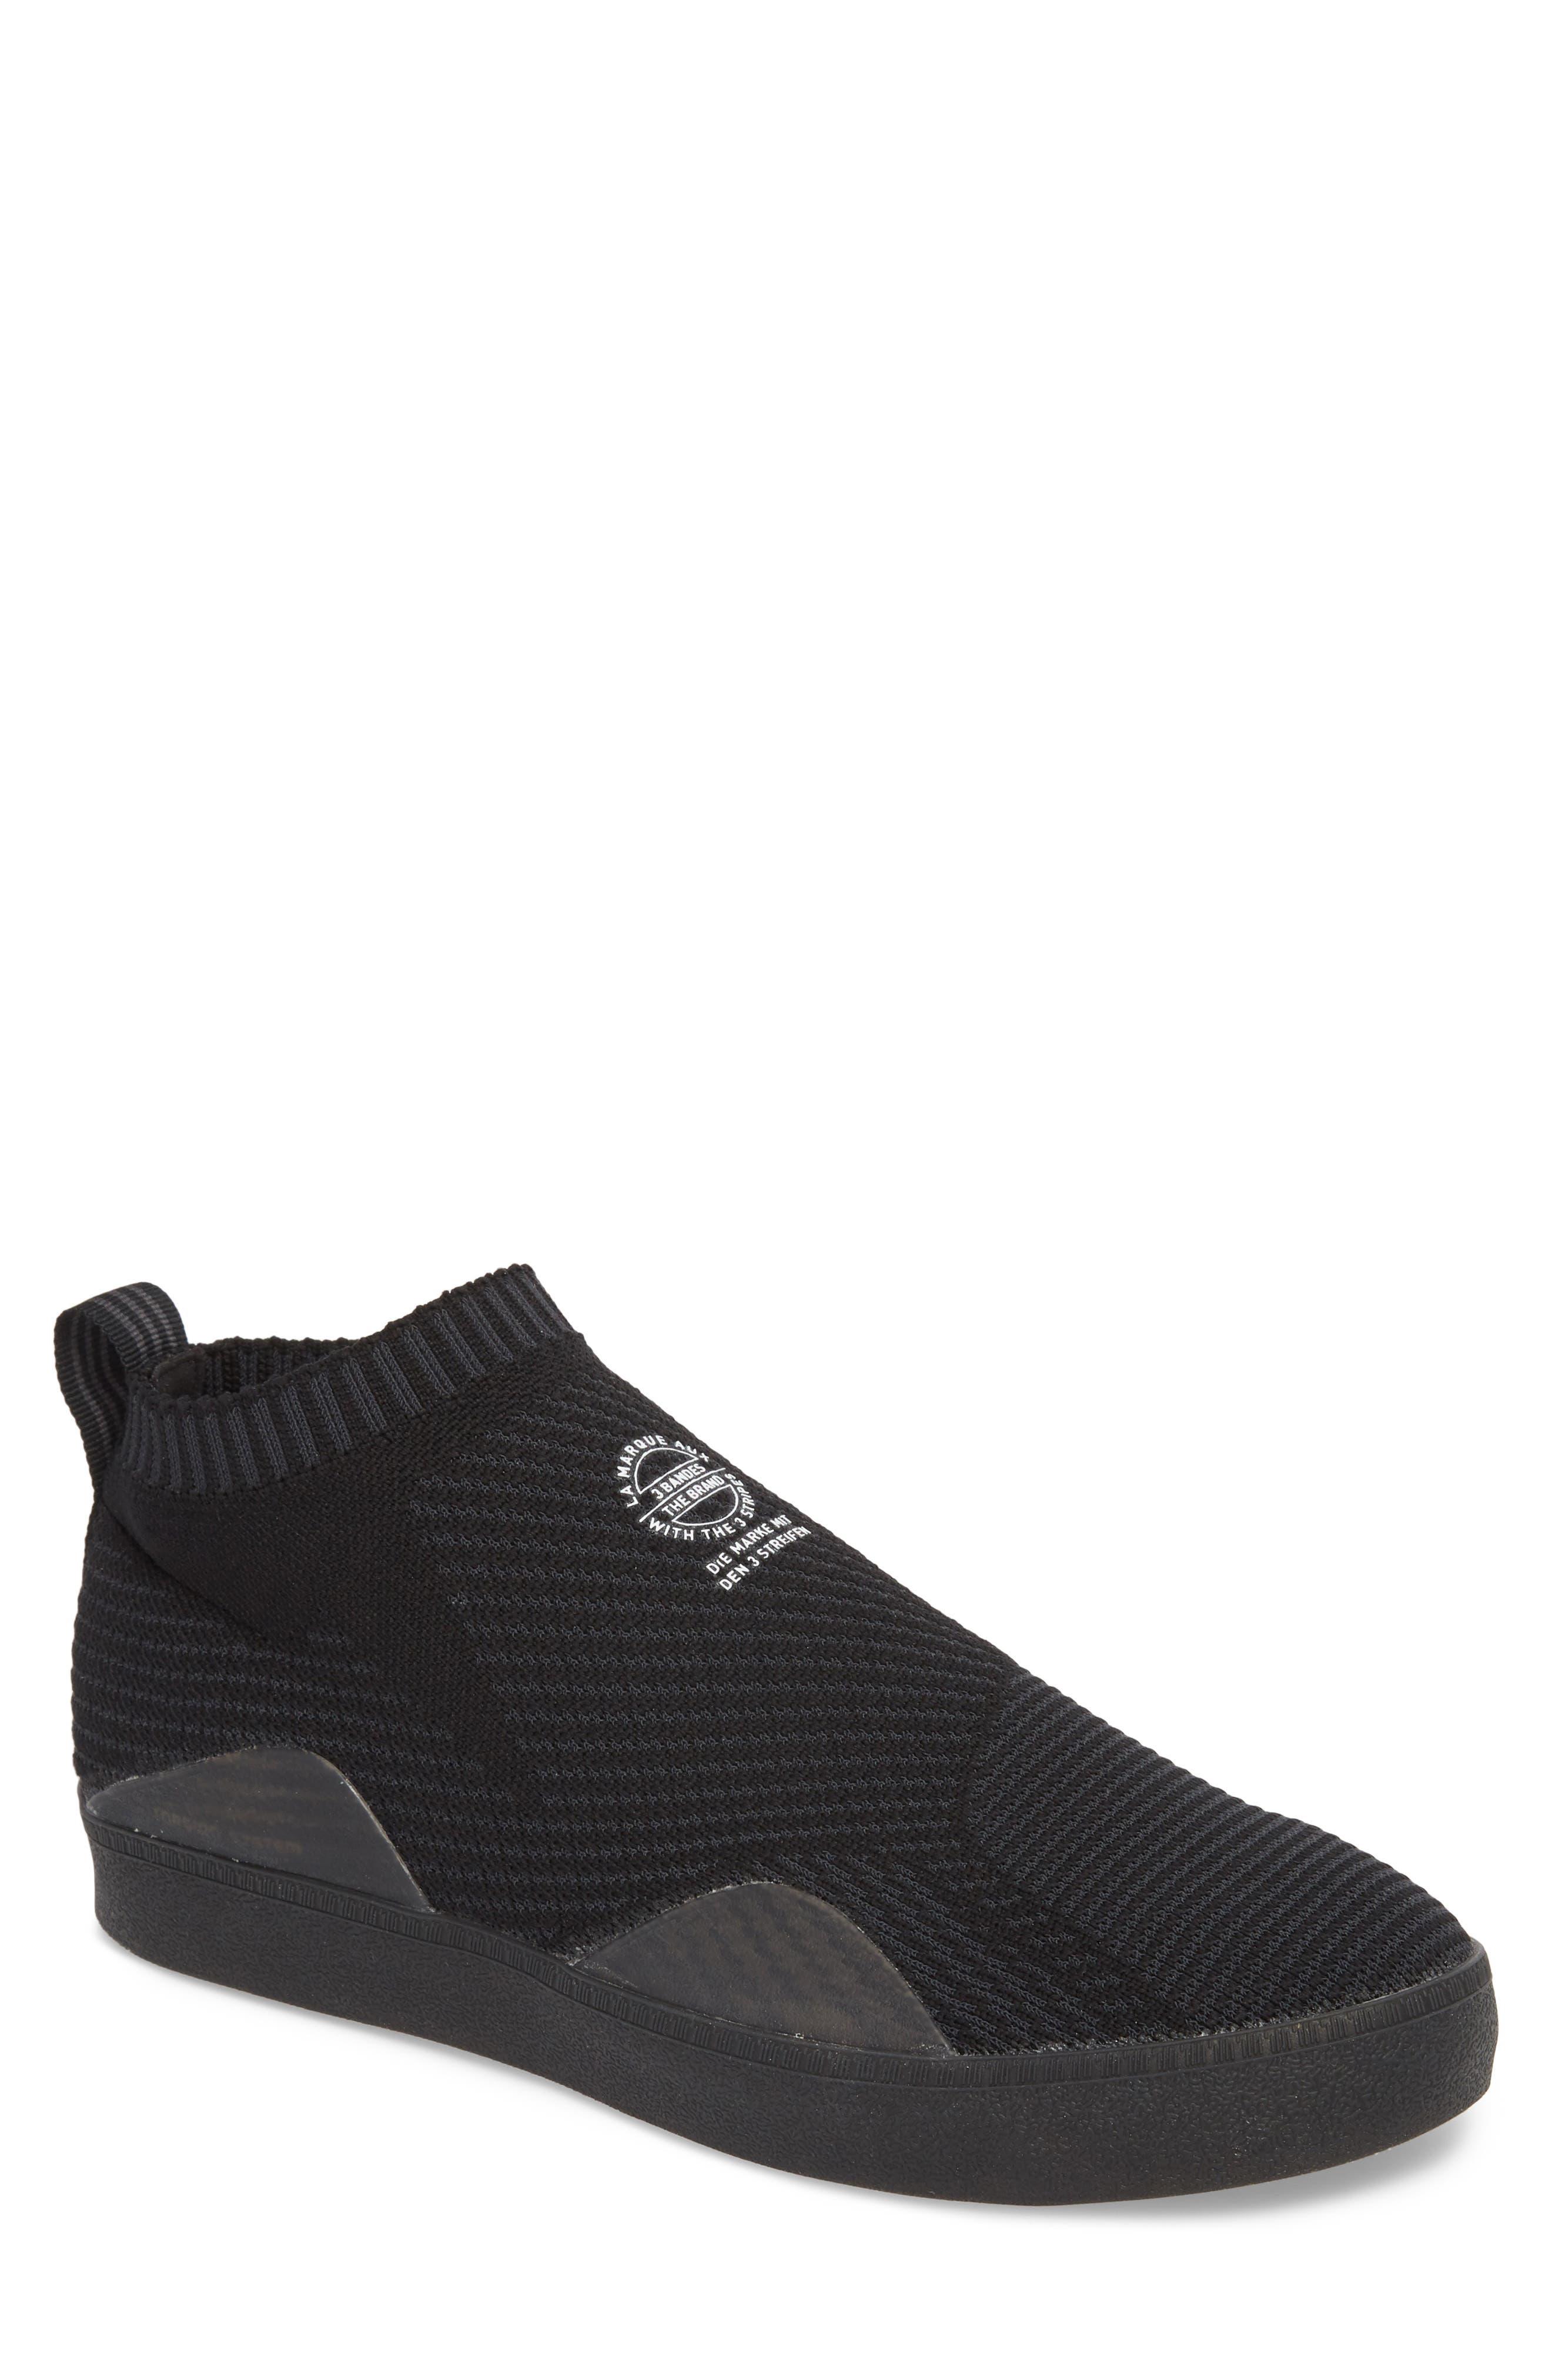 adidas originali primeknit skateboard scarpa, cuore nero